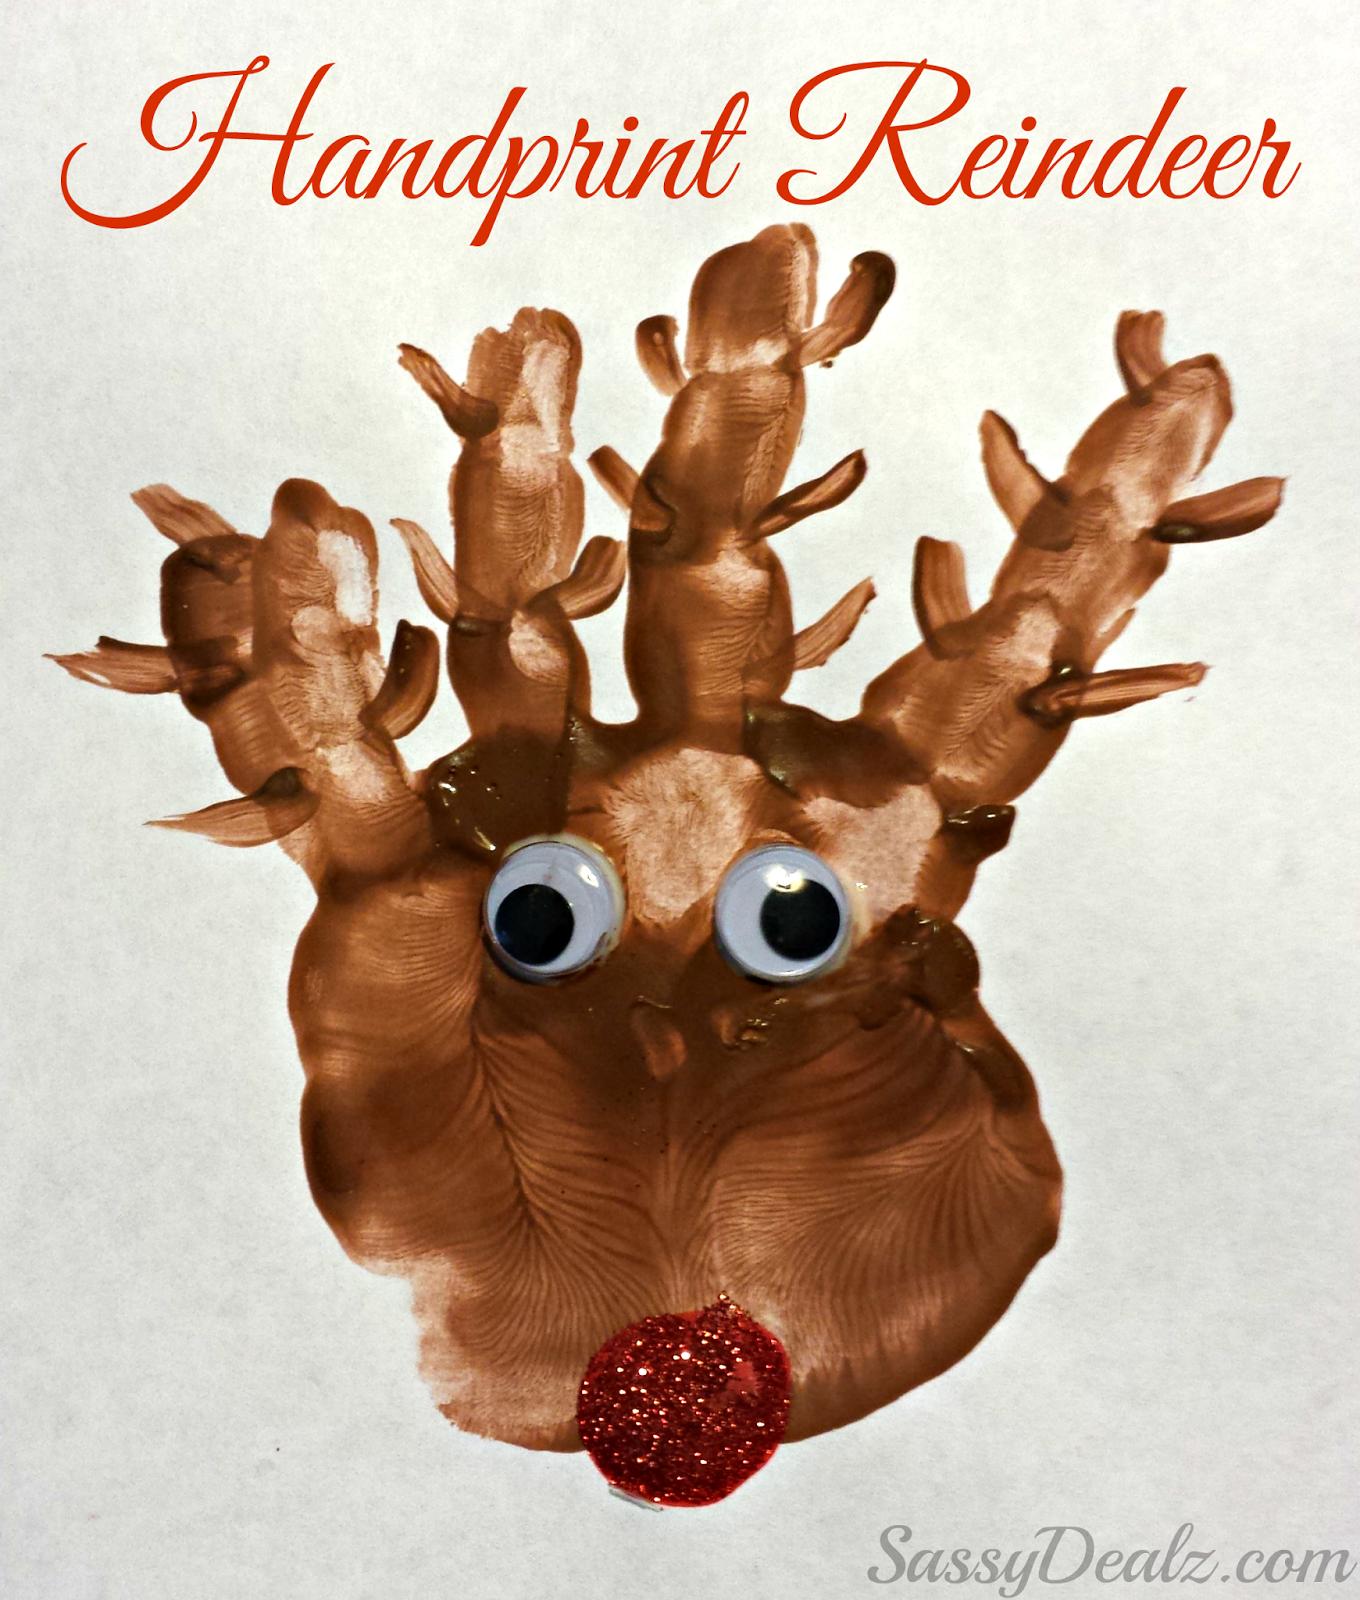 Christmas Craft Project Ideas Part - 28: Reindeer Craft Projects | Handprint Reindeer Christmas Craft For Kids  (Paint Project)